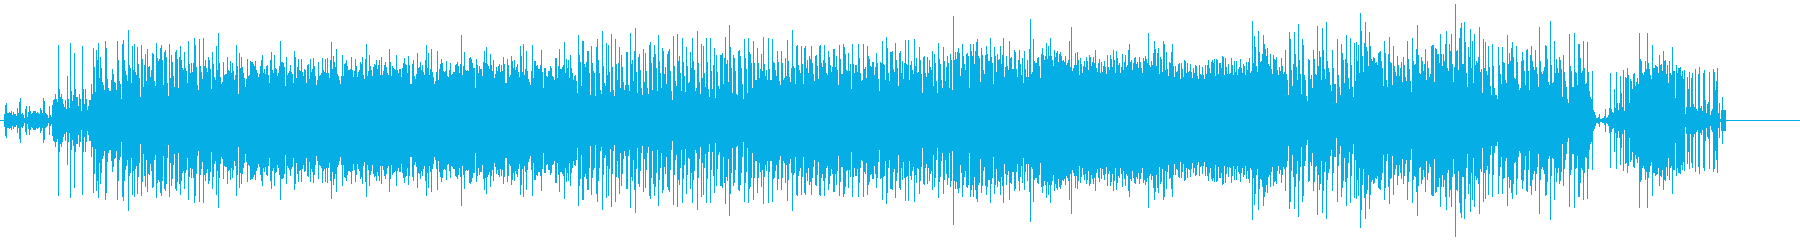 deeptechnoの再生済みの波形